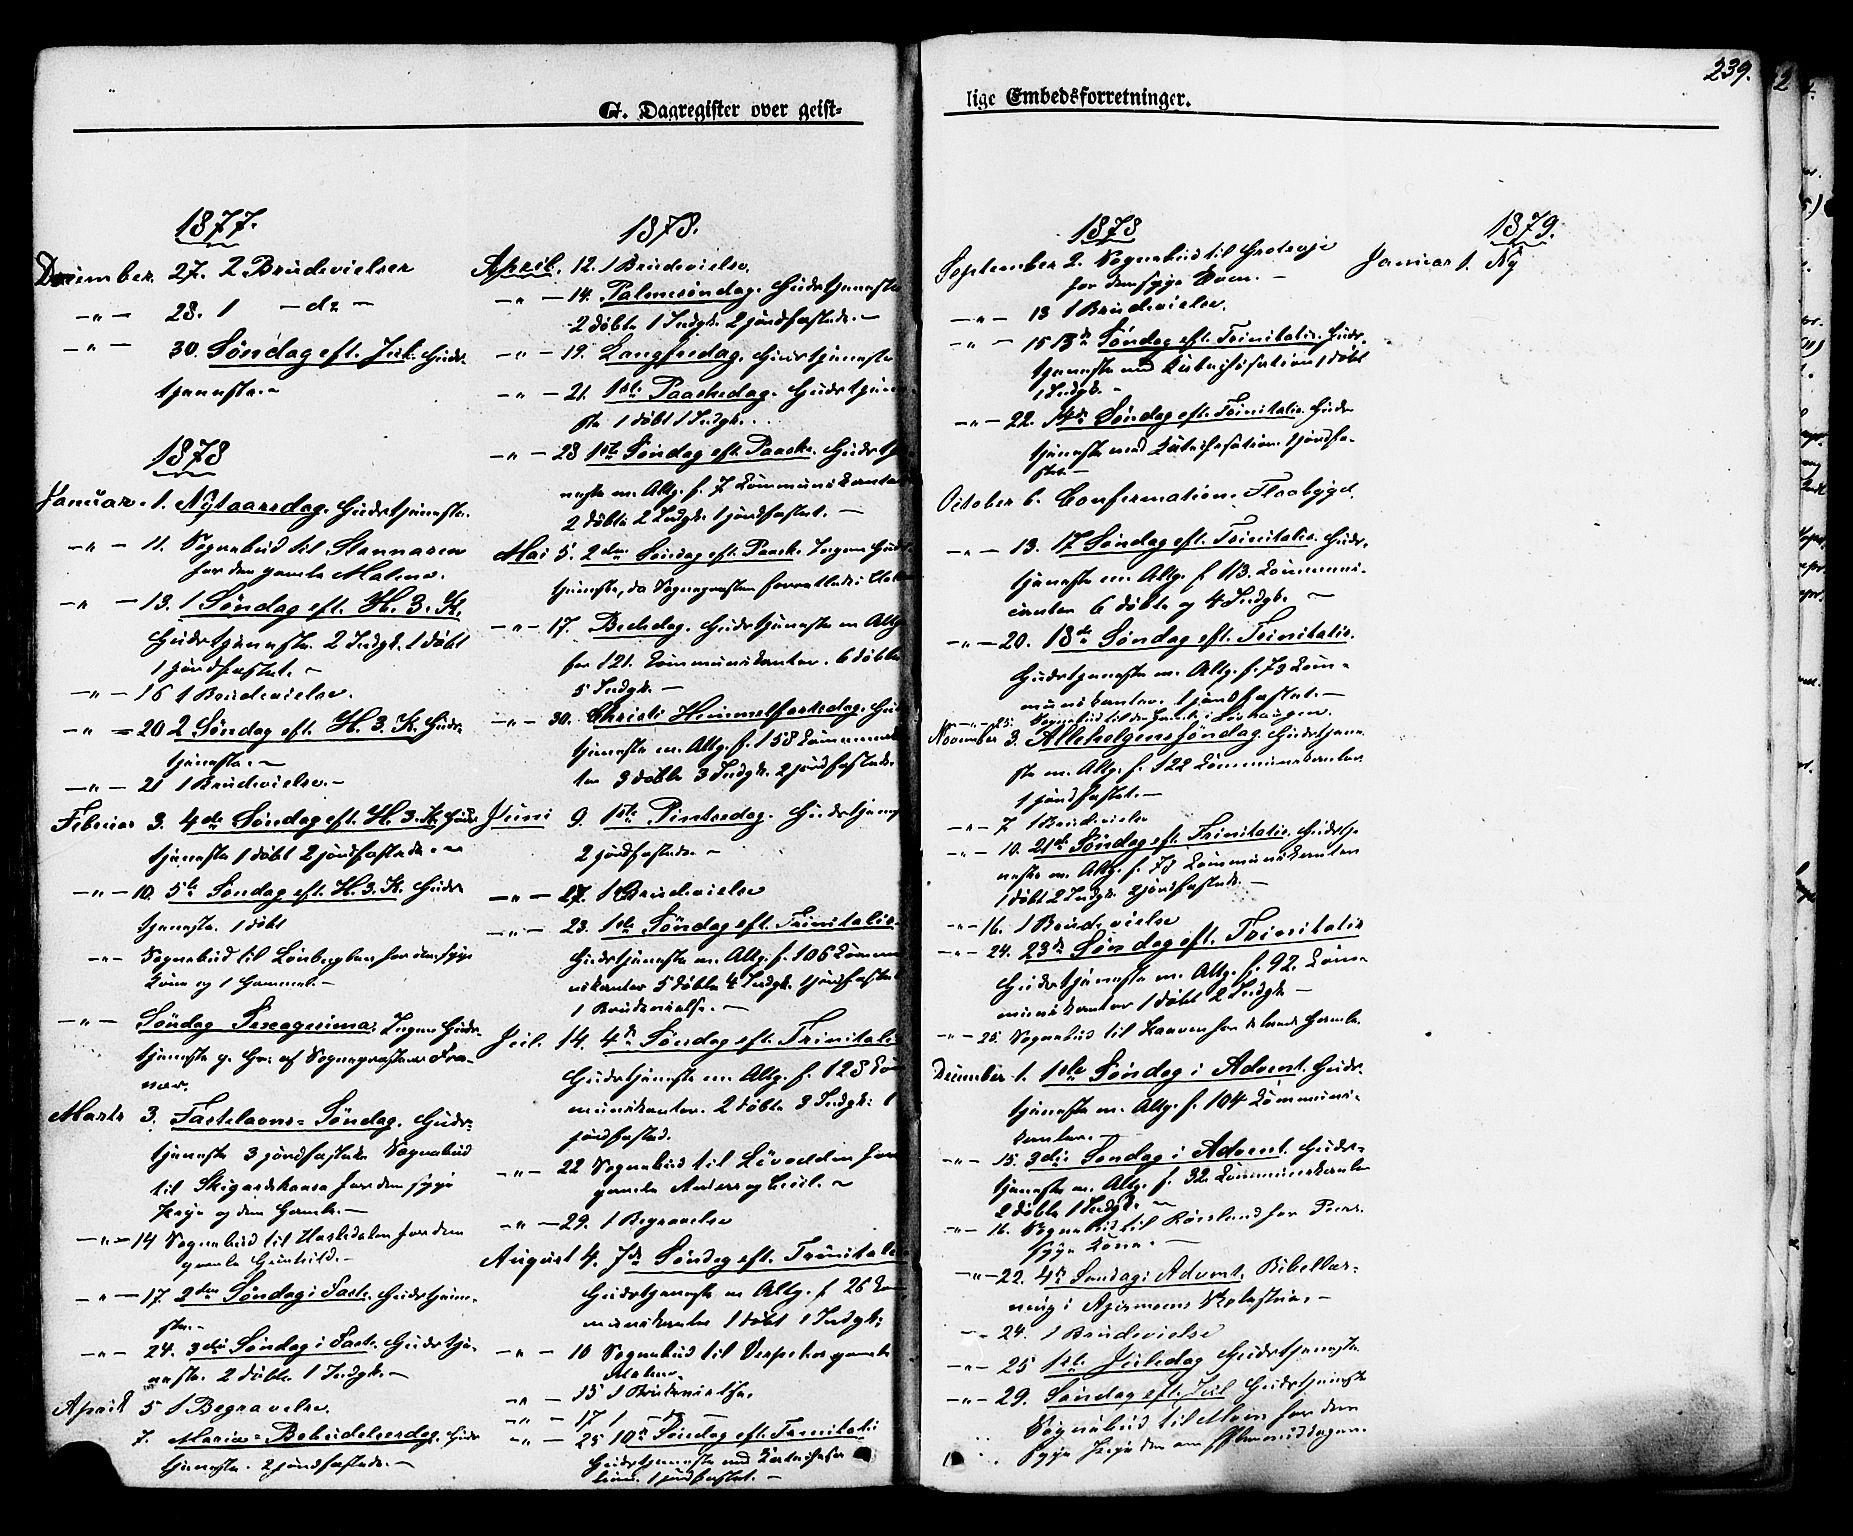 SAKO, Lunde kirkebøker, F/Fa/L0001: Ministerialbok nr. I 1, 1866-1883, s. 239